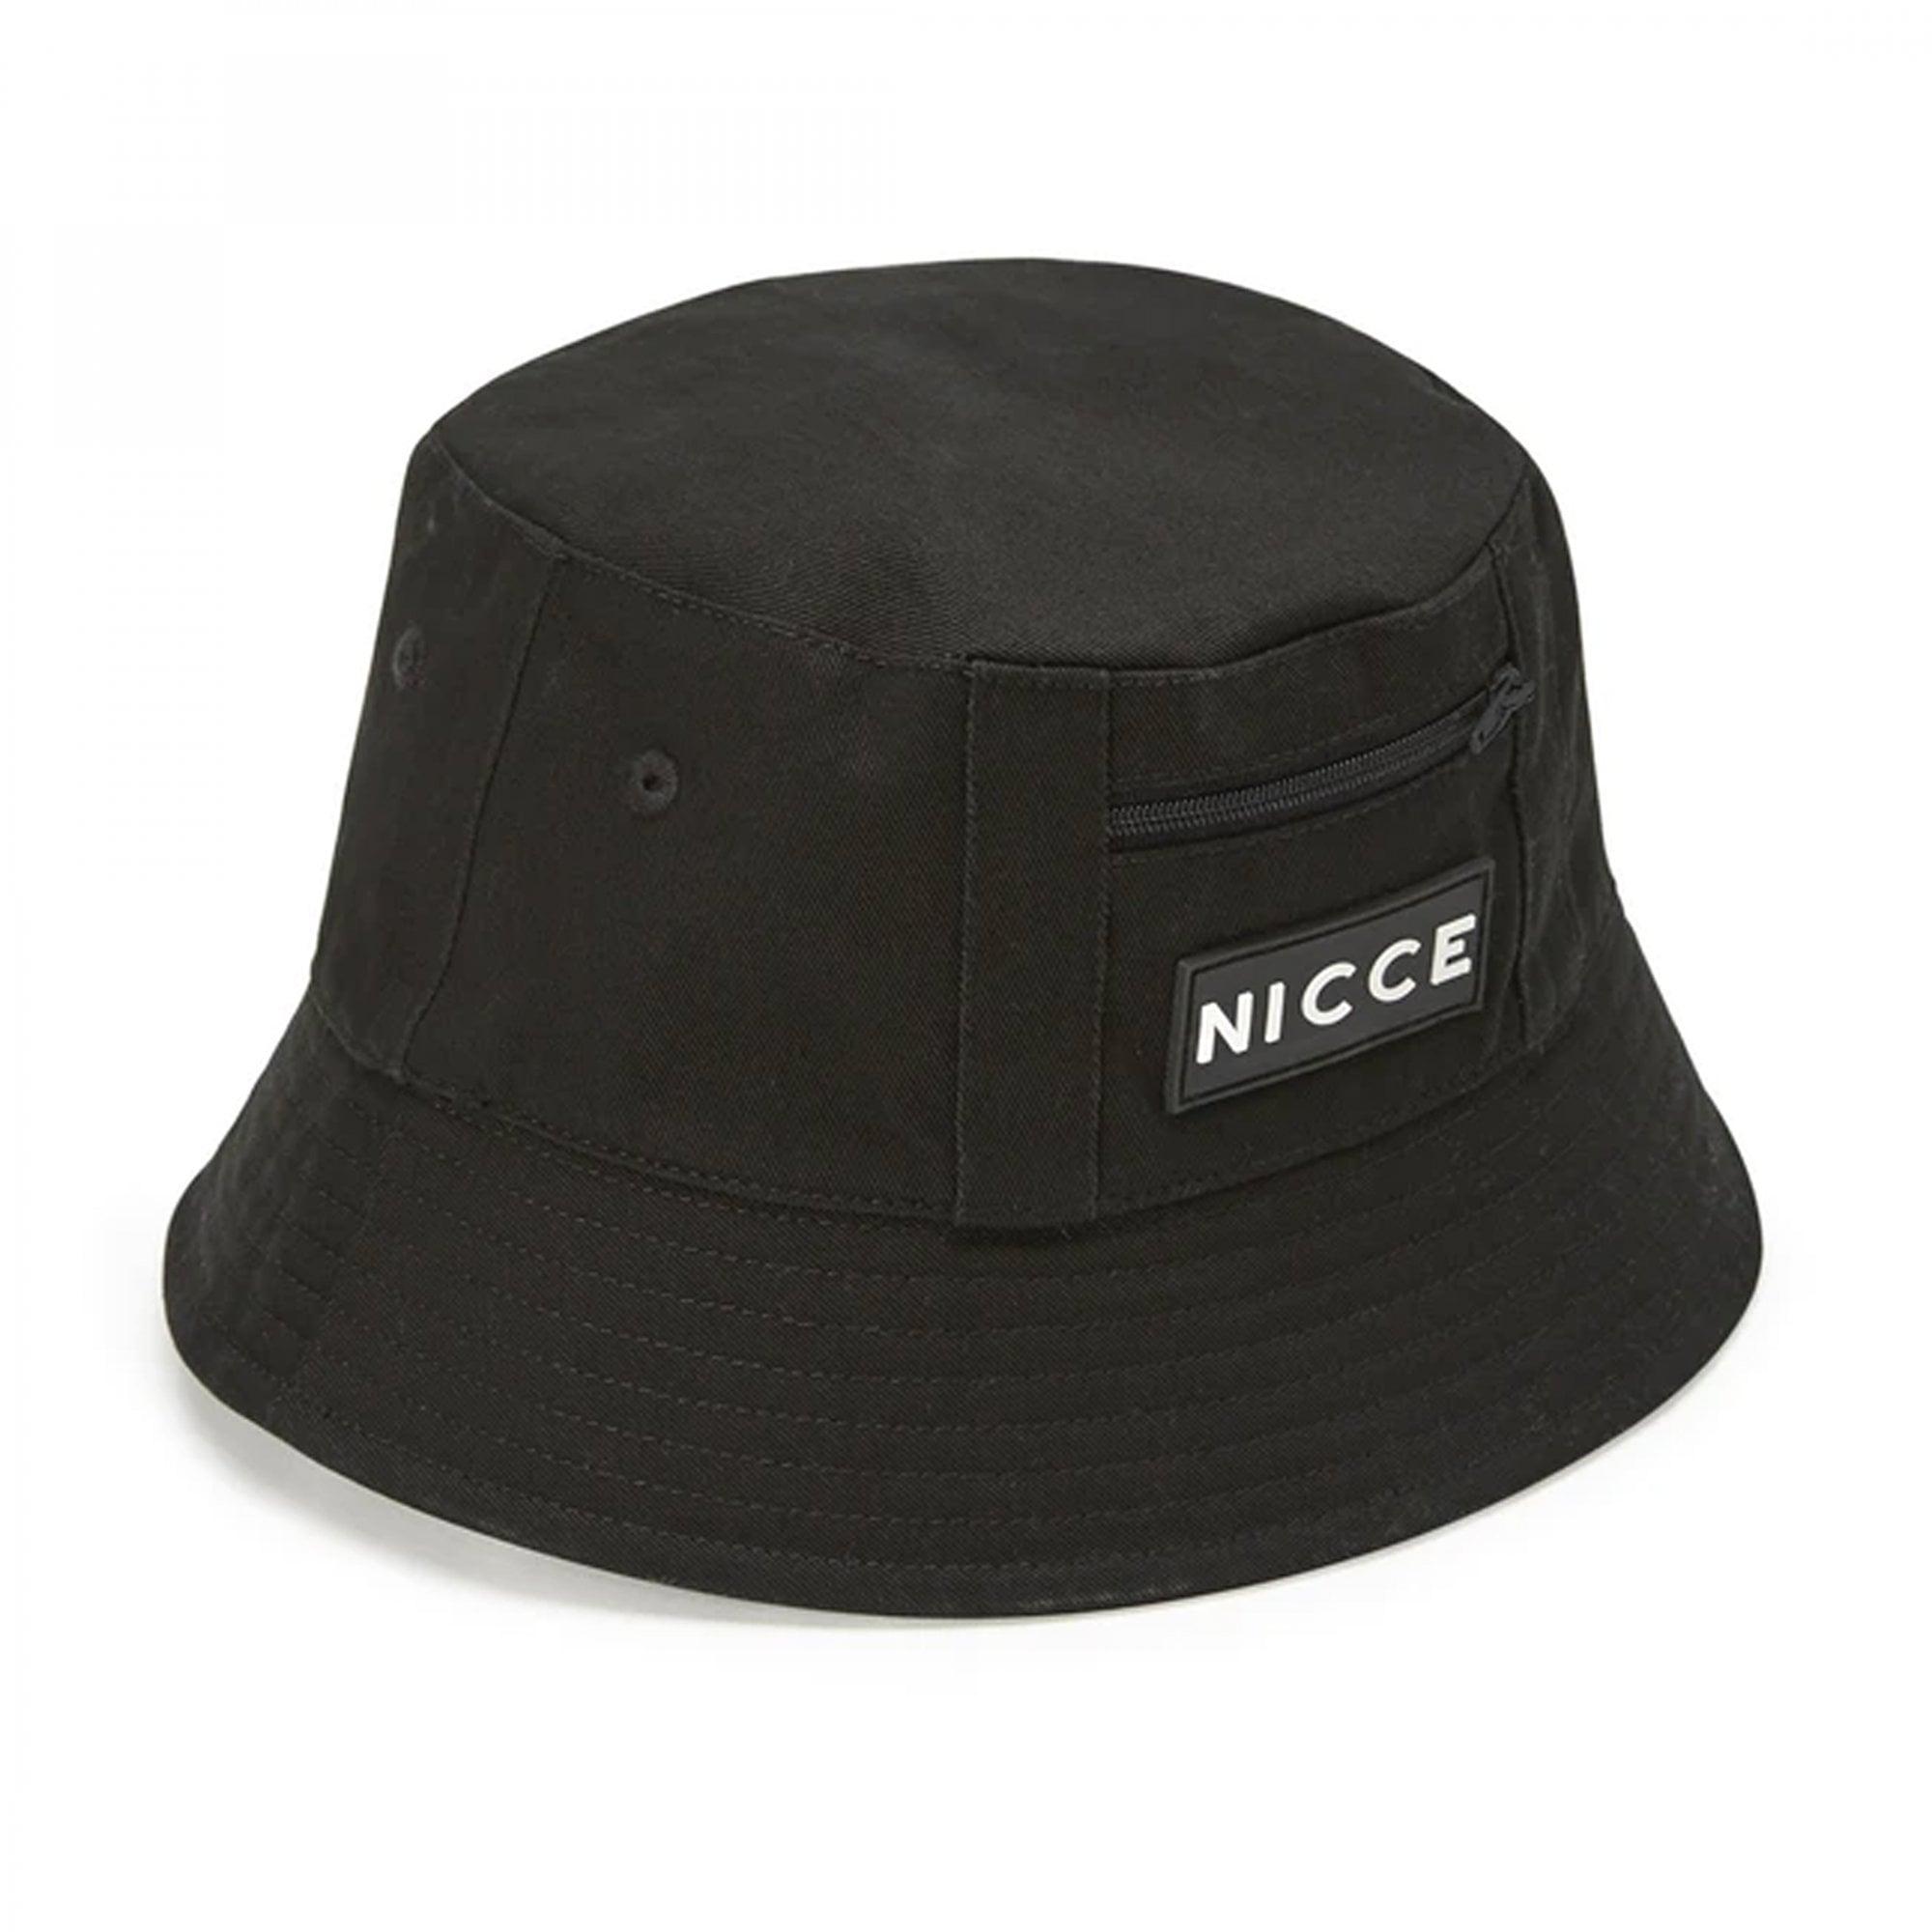 Nicce Acer Rubber Logo Black Baseball Cap